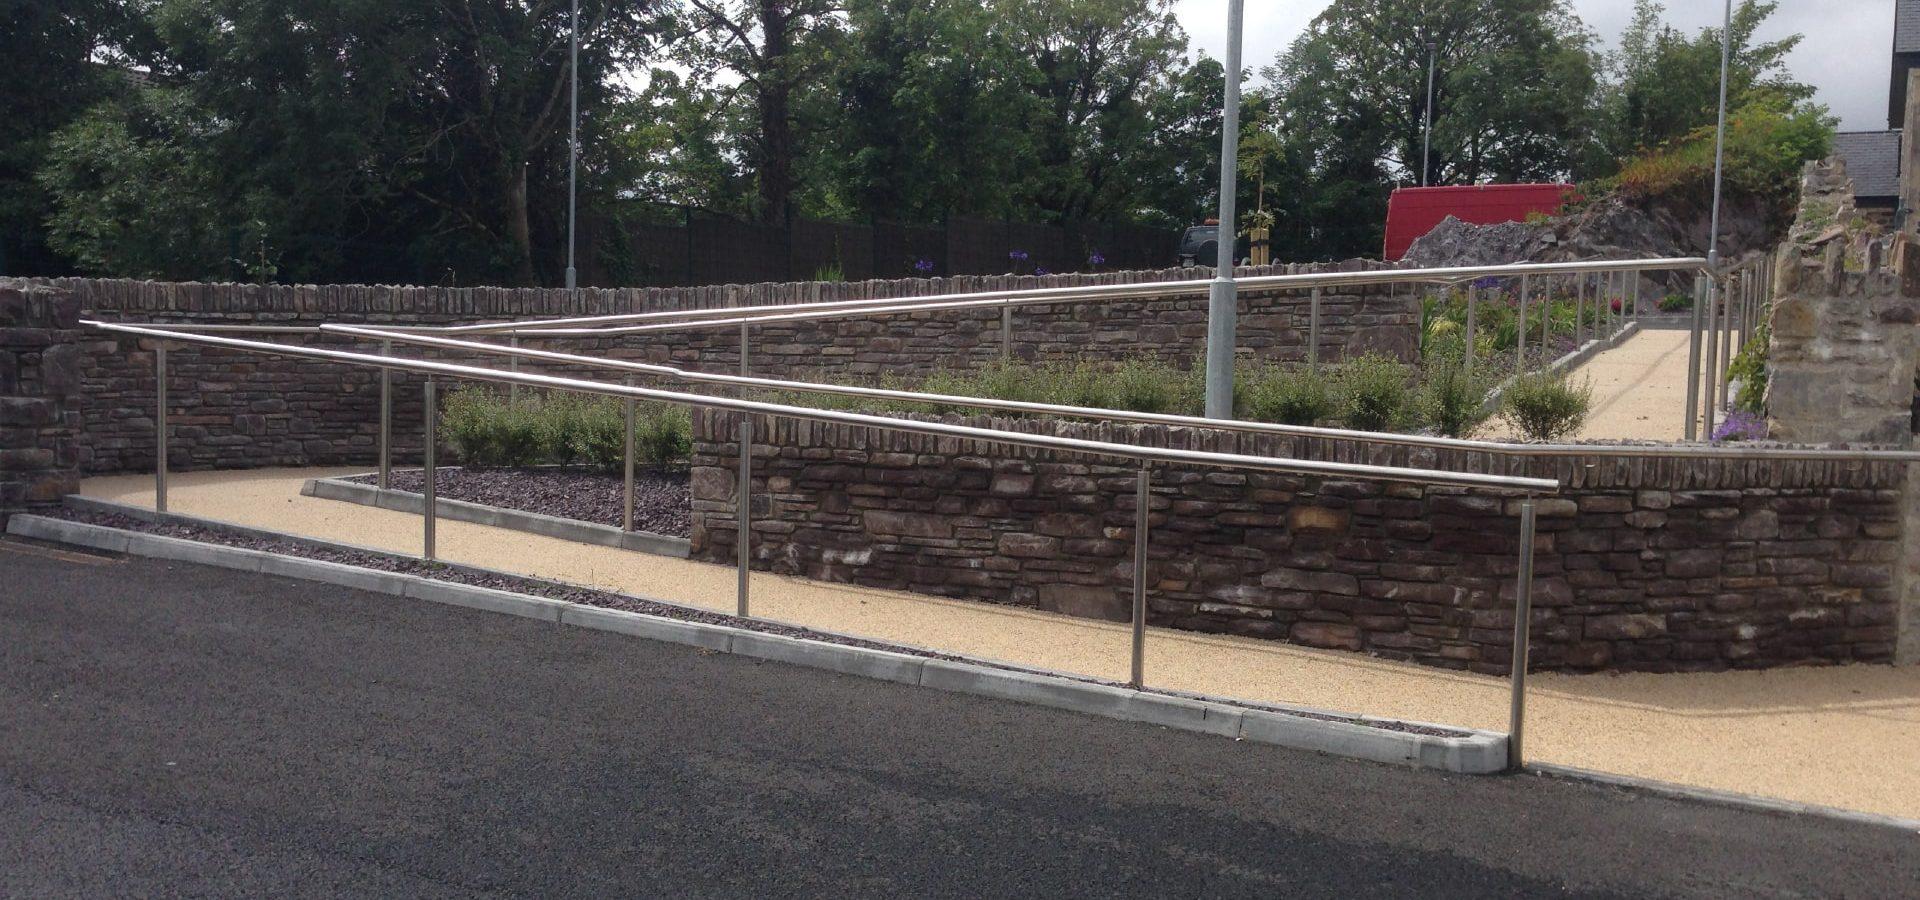 Architectural - SX Engineering - Sneem church rails 2